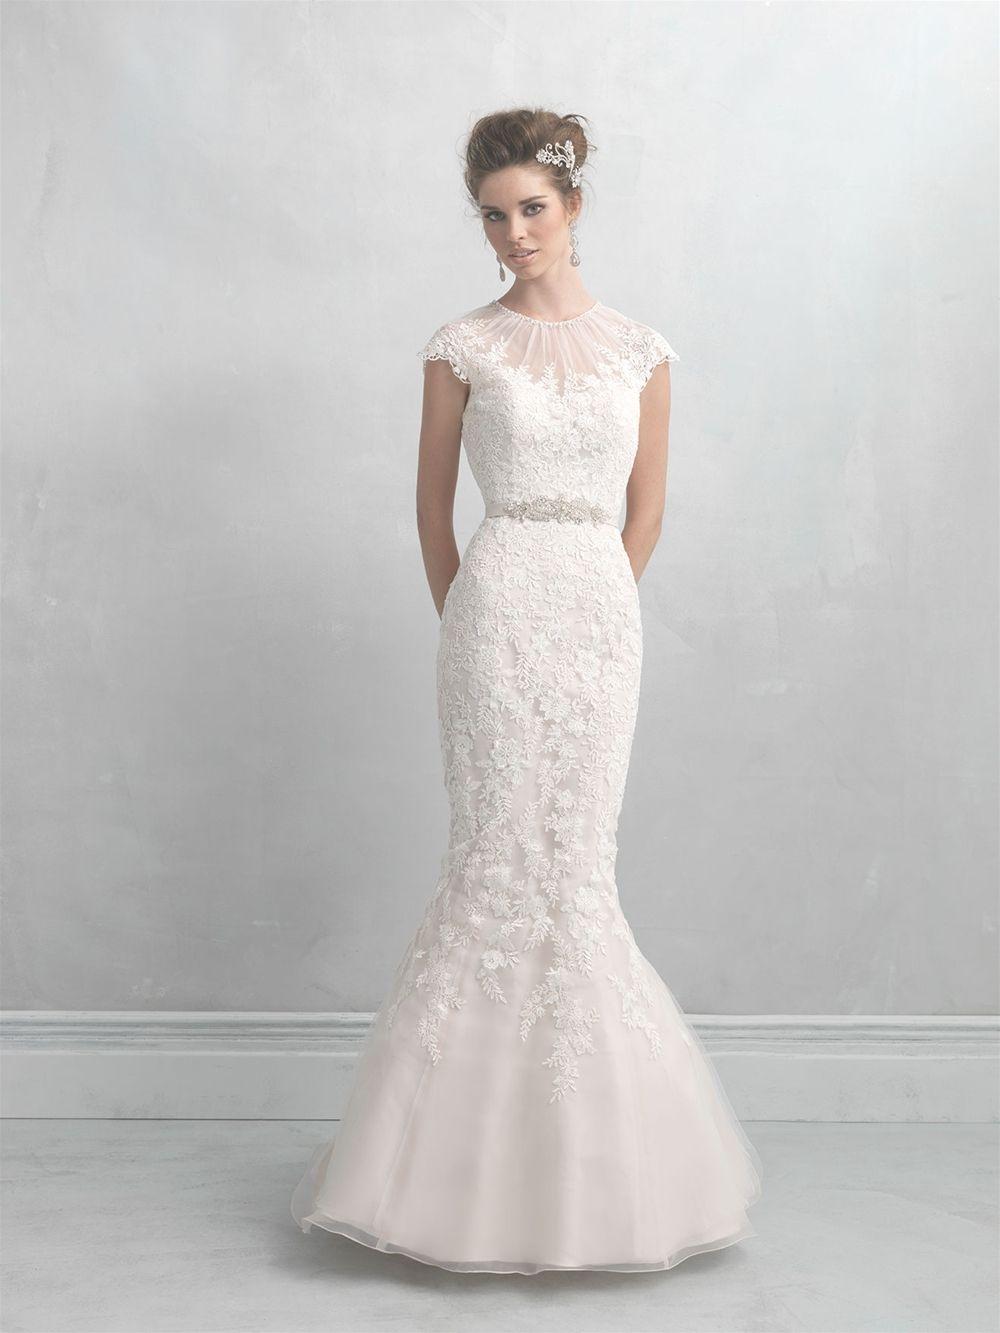 Wedding dress consignment shops near me  KleinfeldBridal Madison James Bridal Gown  Mermaid